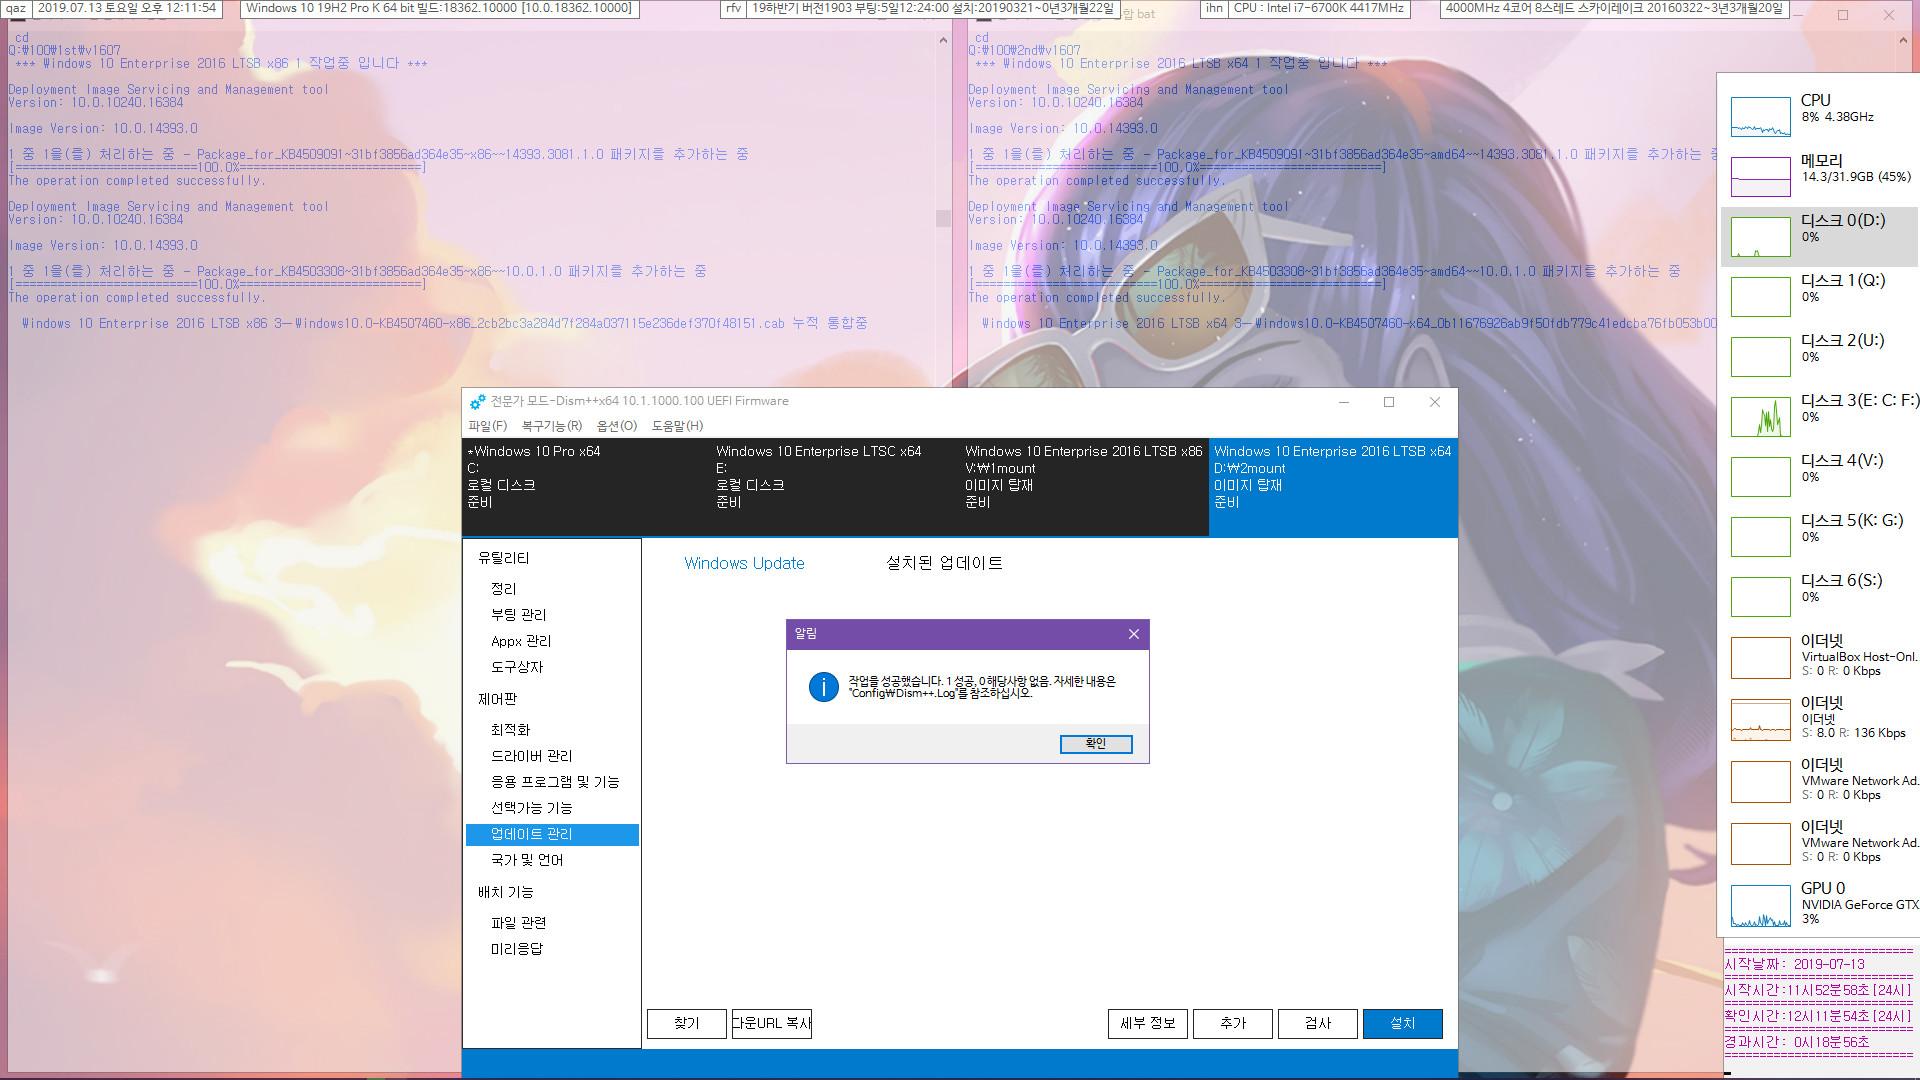 Windows 10 버전 1607 누적 업데이트 KB4507460 (OS 빌드 14393.3085) [2019-07-09 일자] 중에 2016 LTSB 통합중 입니다 2019-07-13_121154.jpg